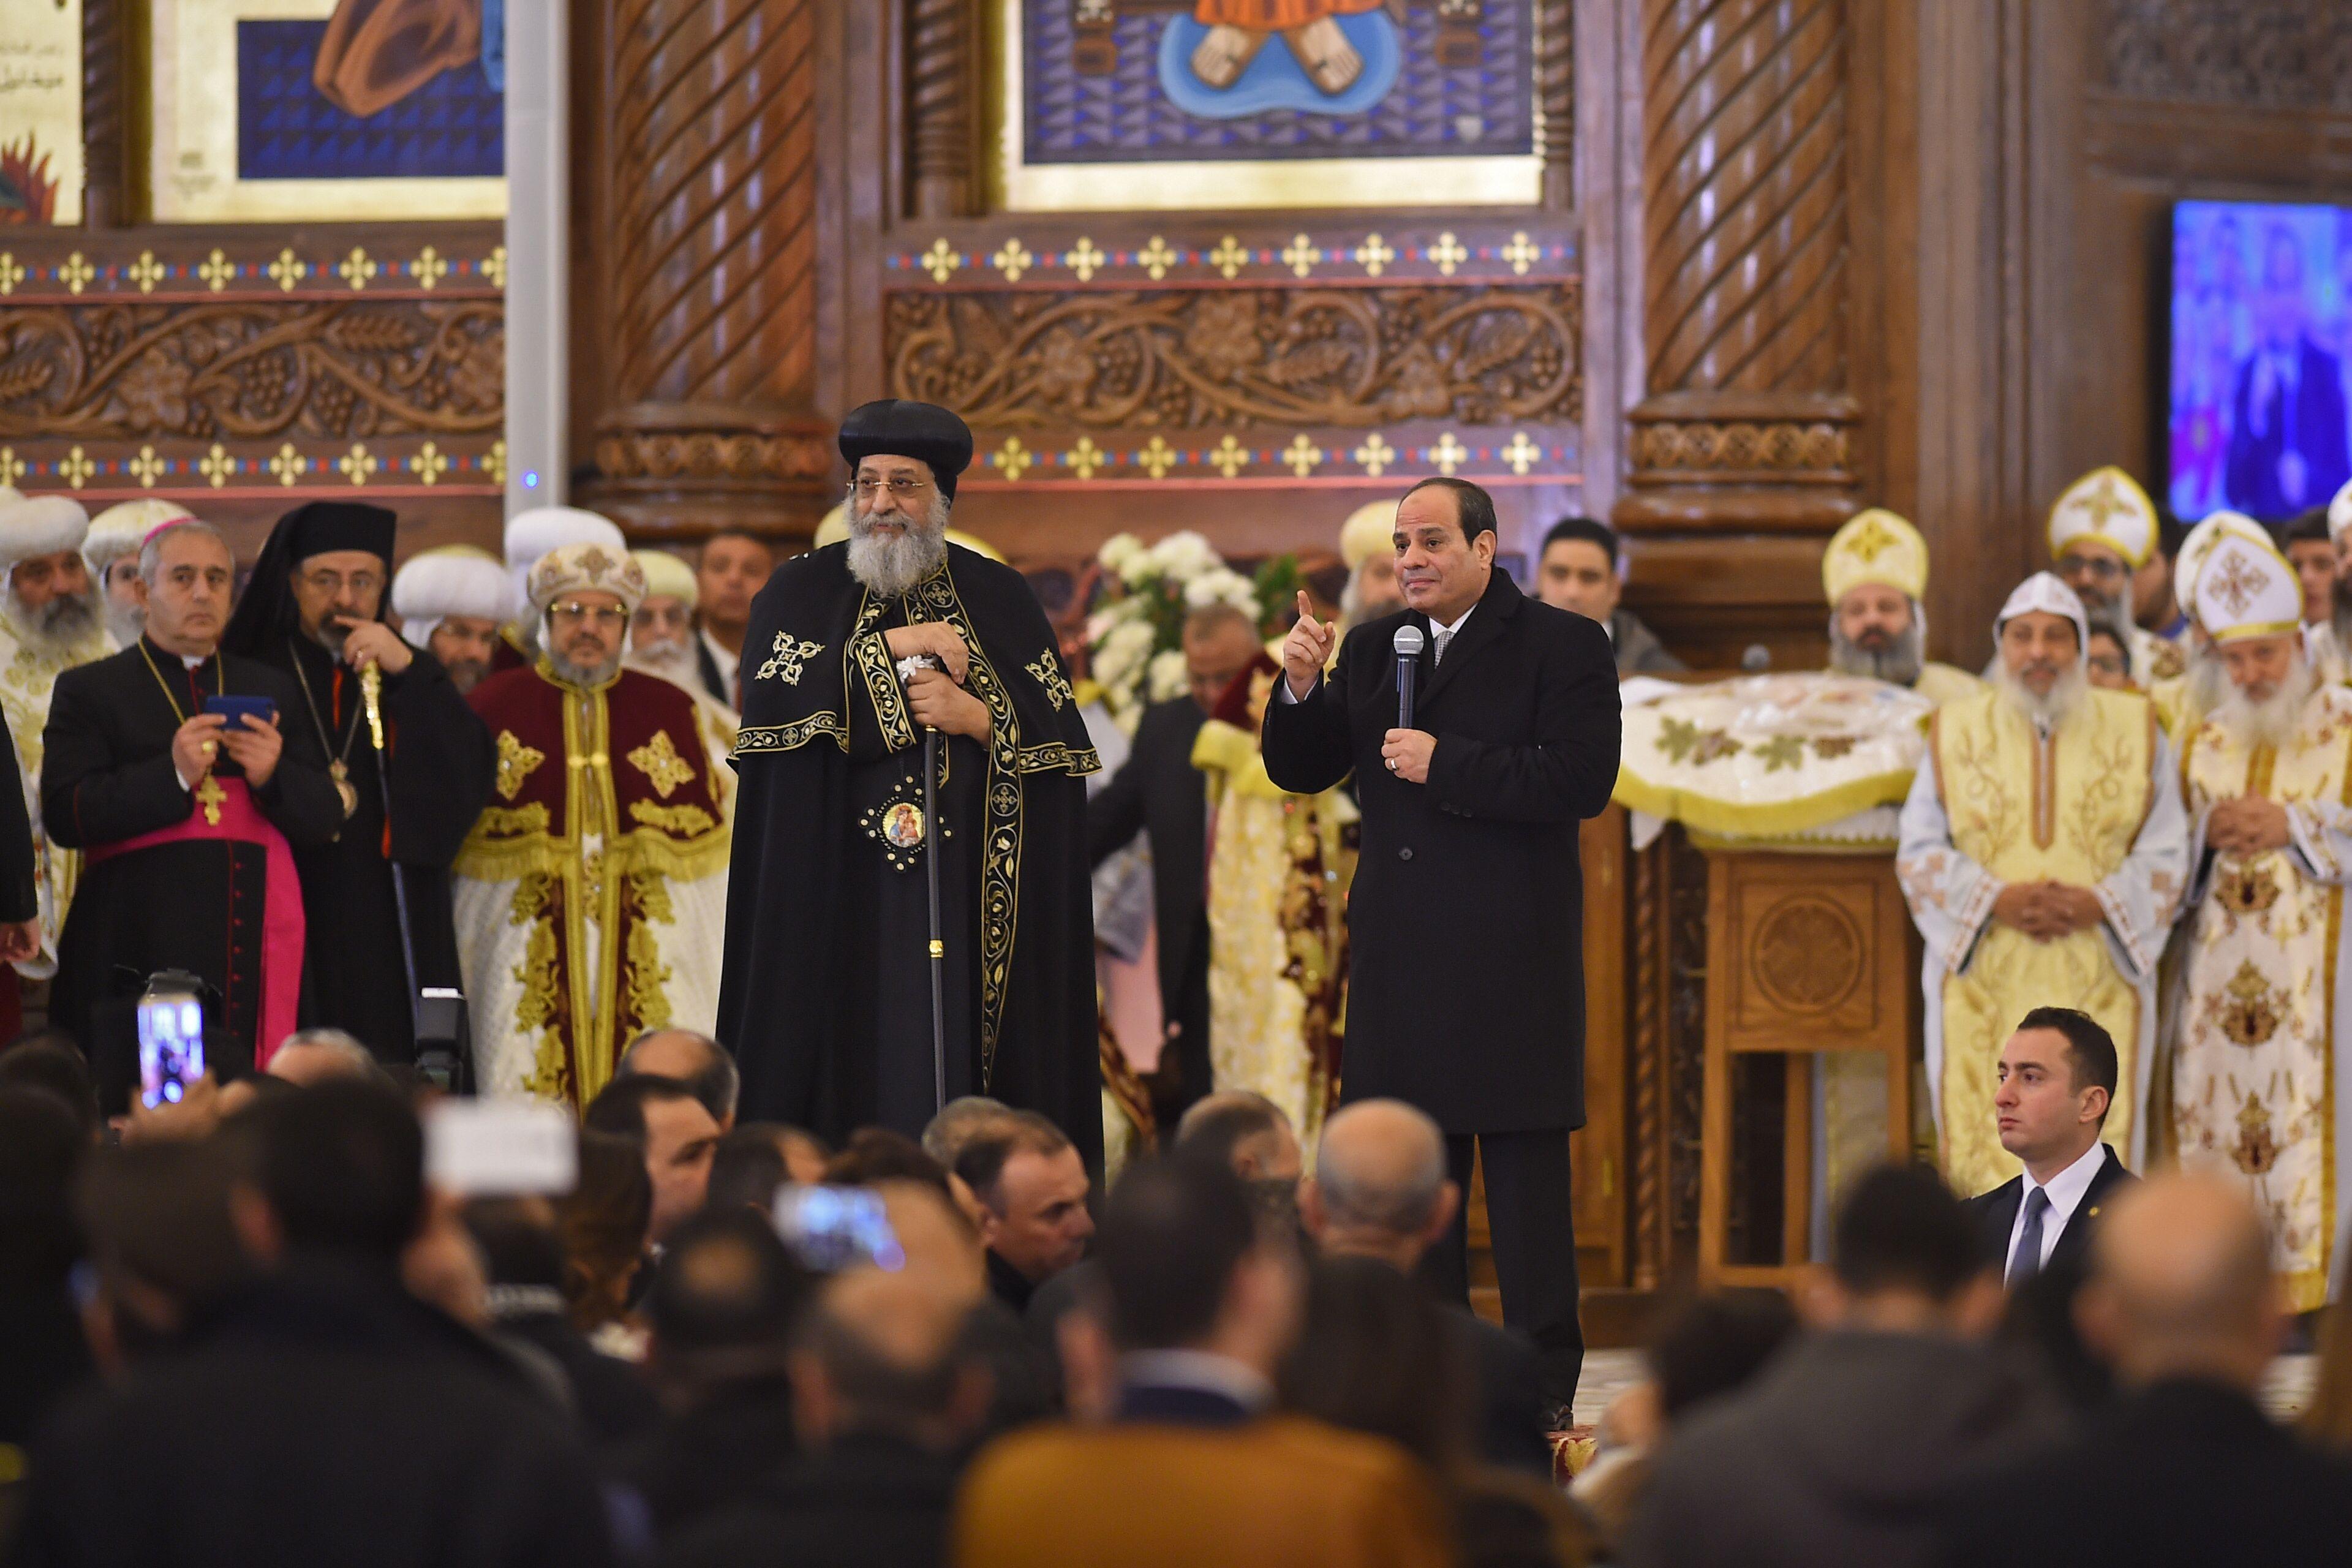 Fotol keskel kopti kiriku paavst Tawadros II ja president Abdel Fattah al-Sisi. Foto: Mohamed el-Shahed / AFP /Scanpix